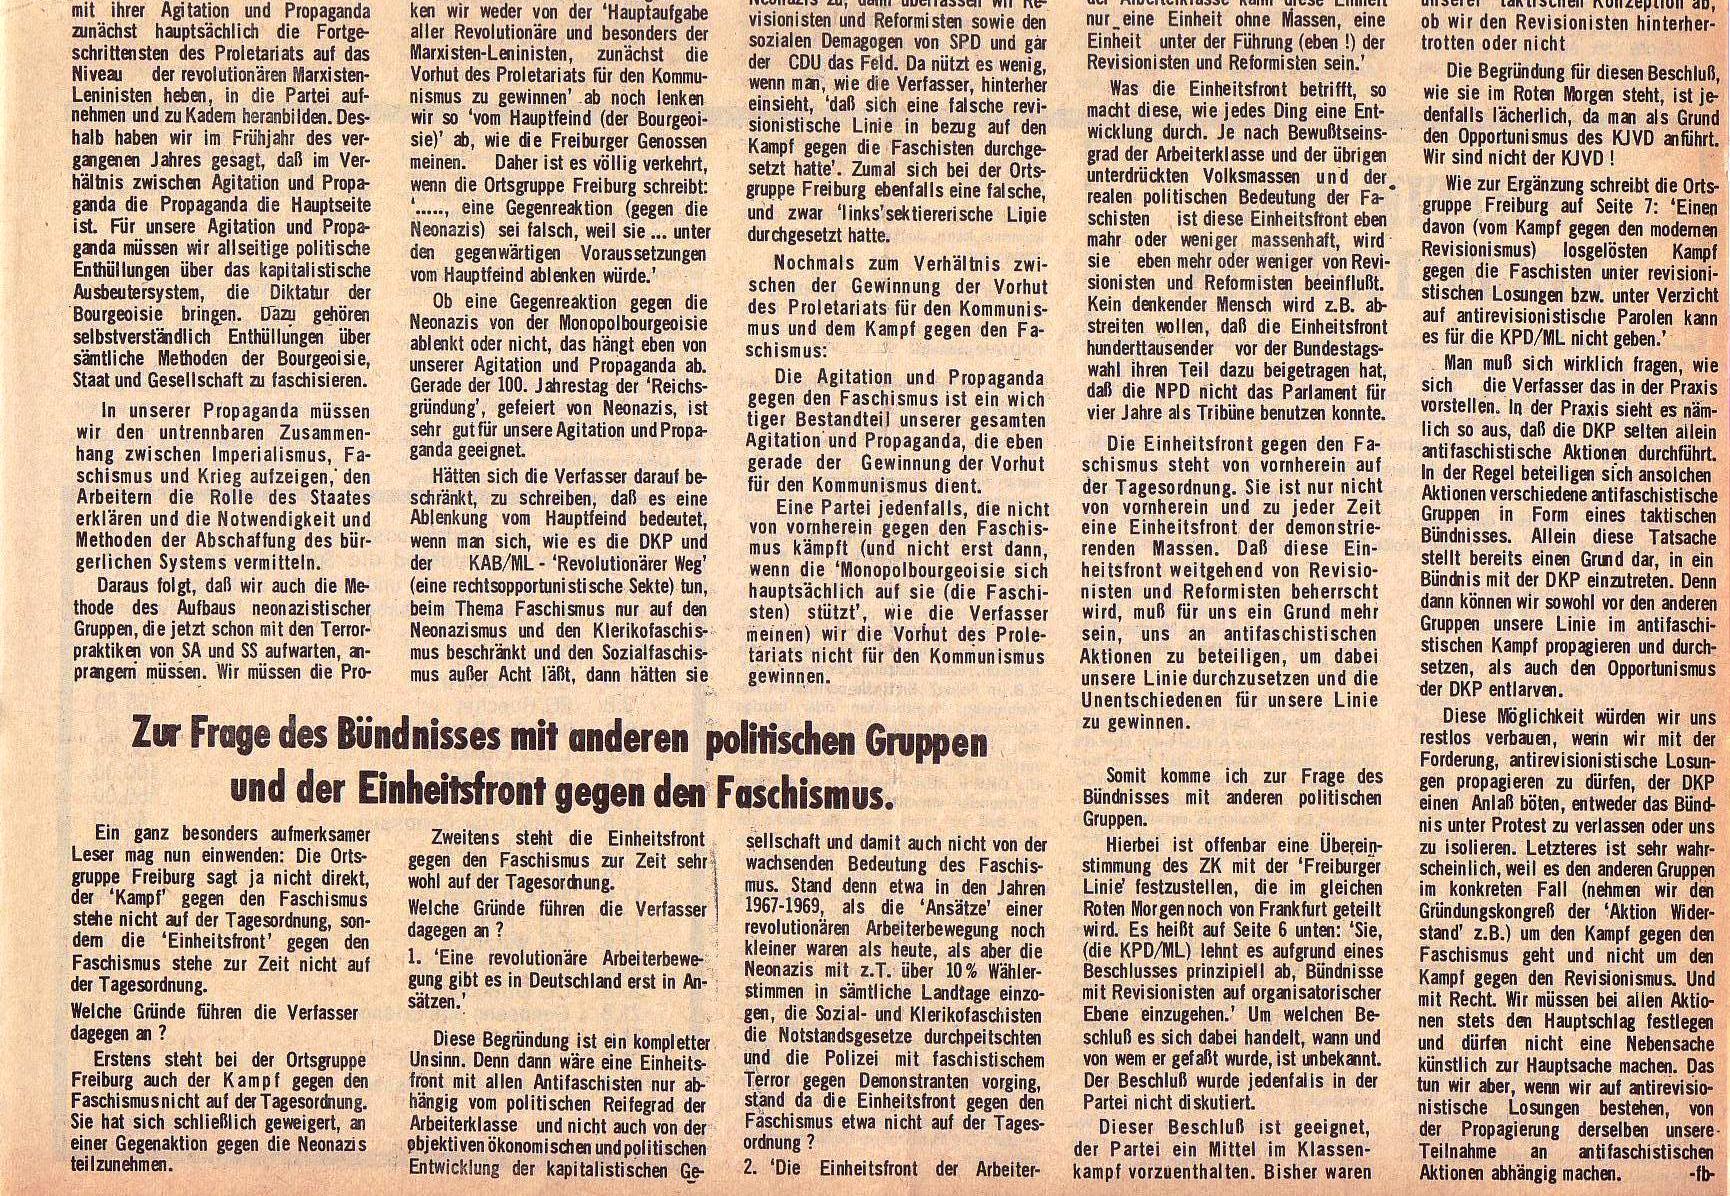 Roter Morgen, 5. Jg., 13. September 1971, Nr. 9, Seite 5b